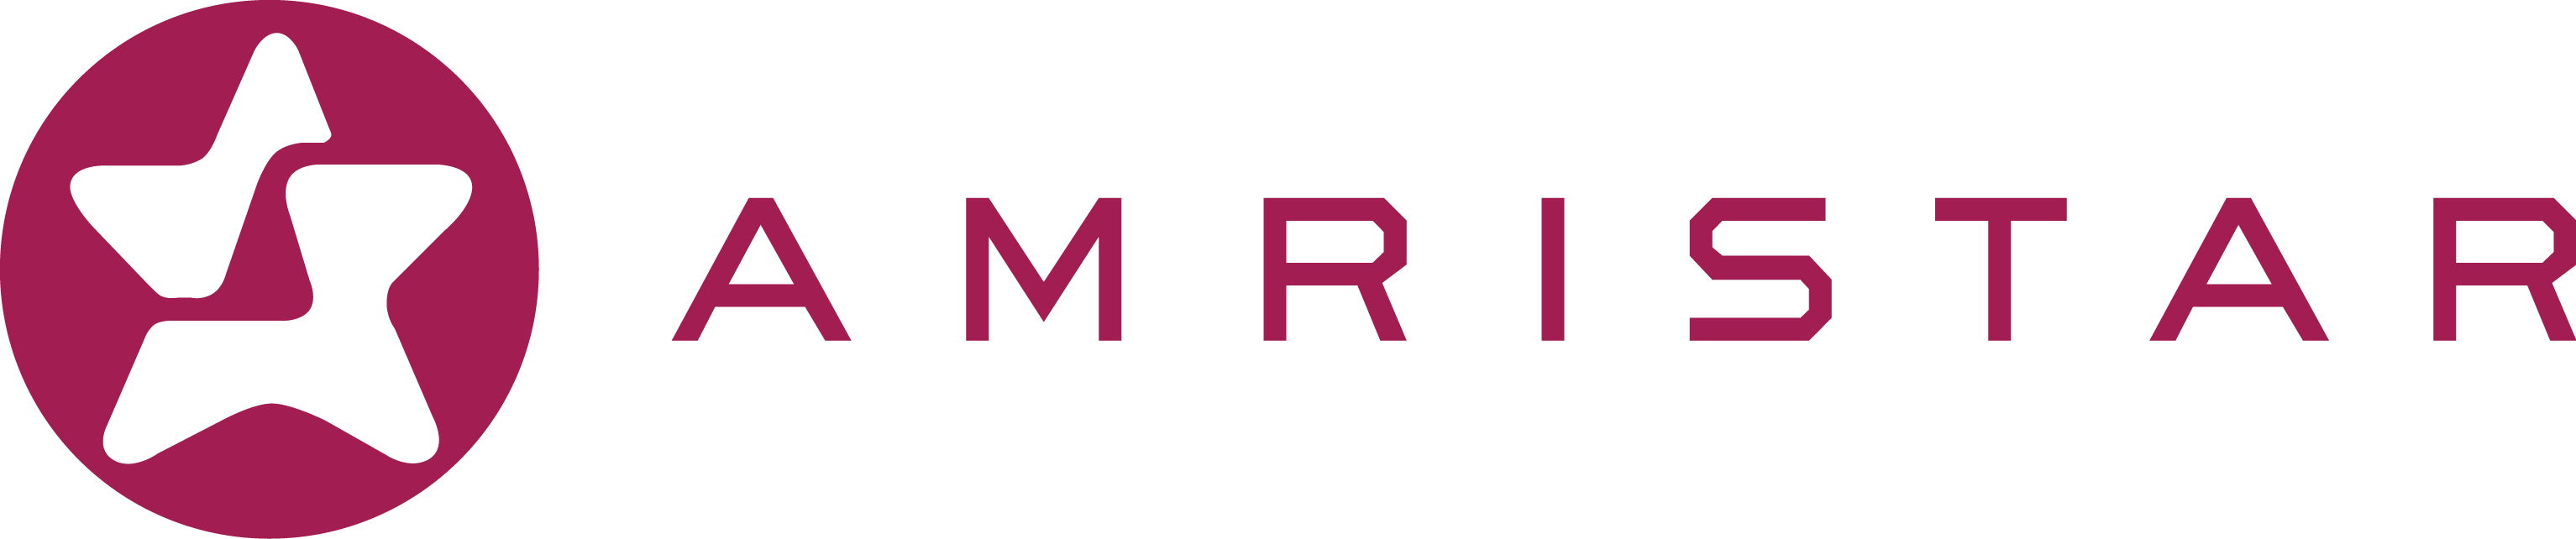 Amristar_logo